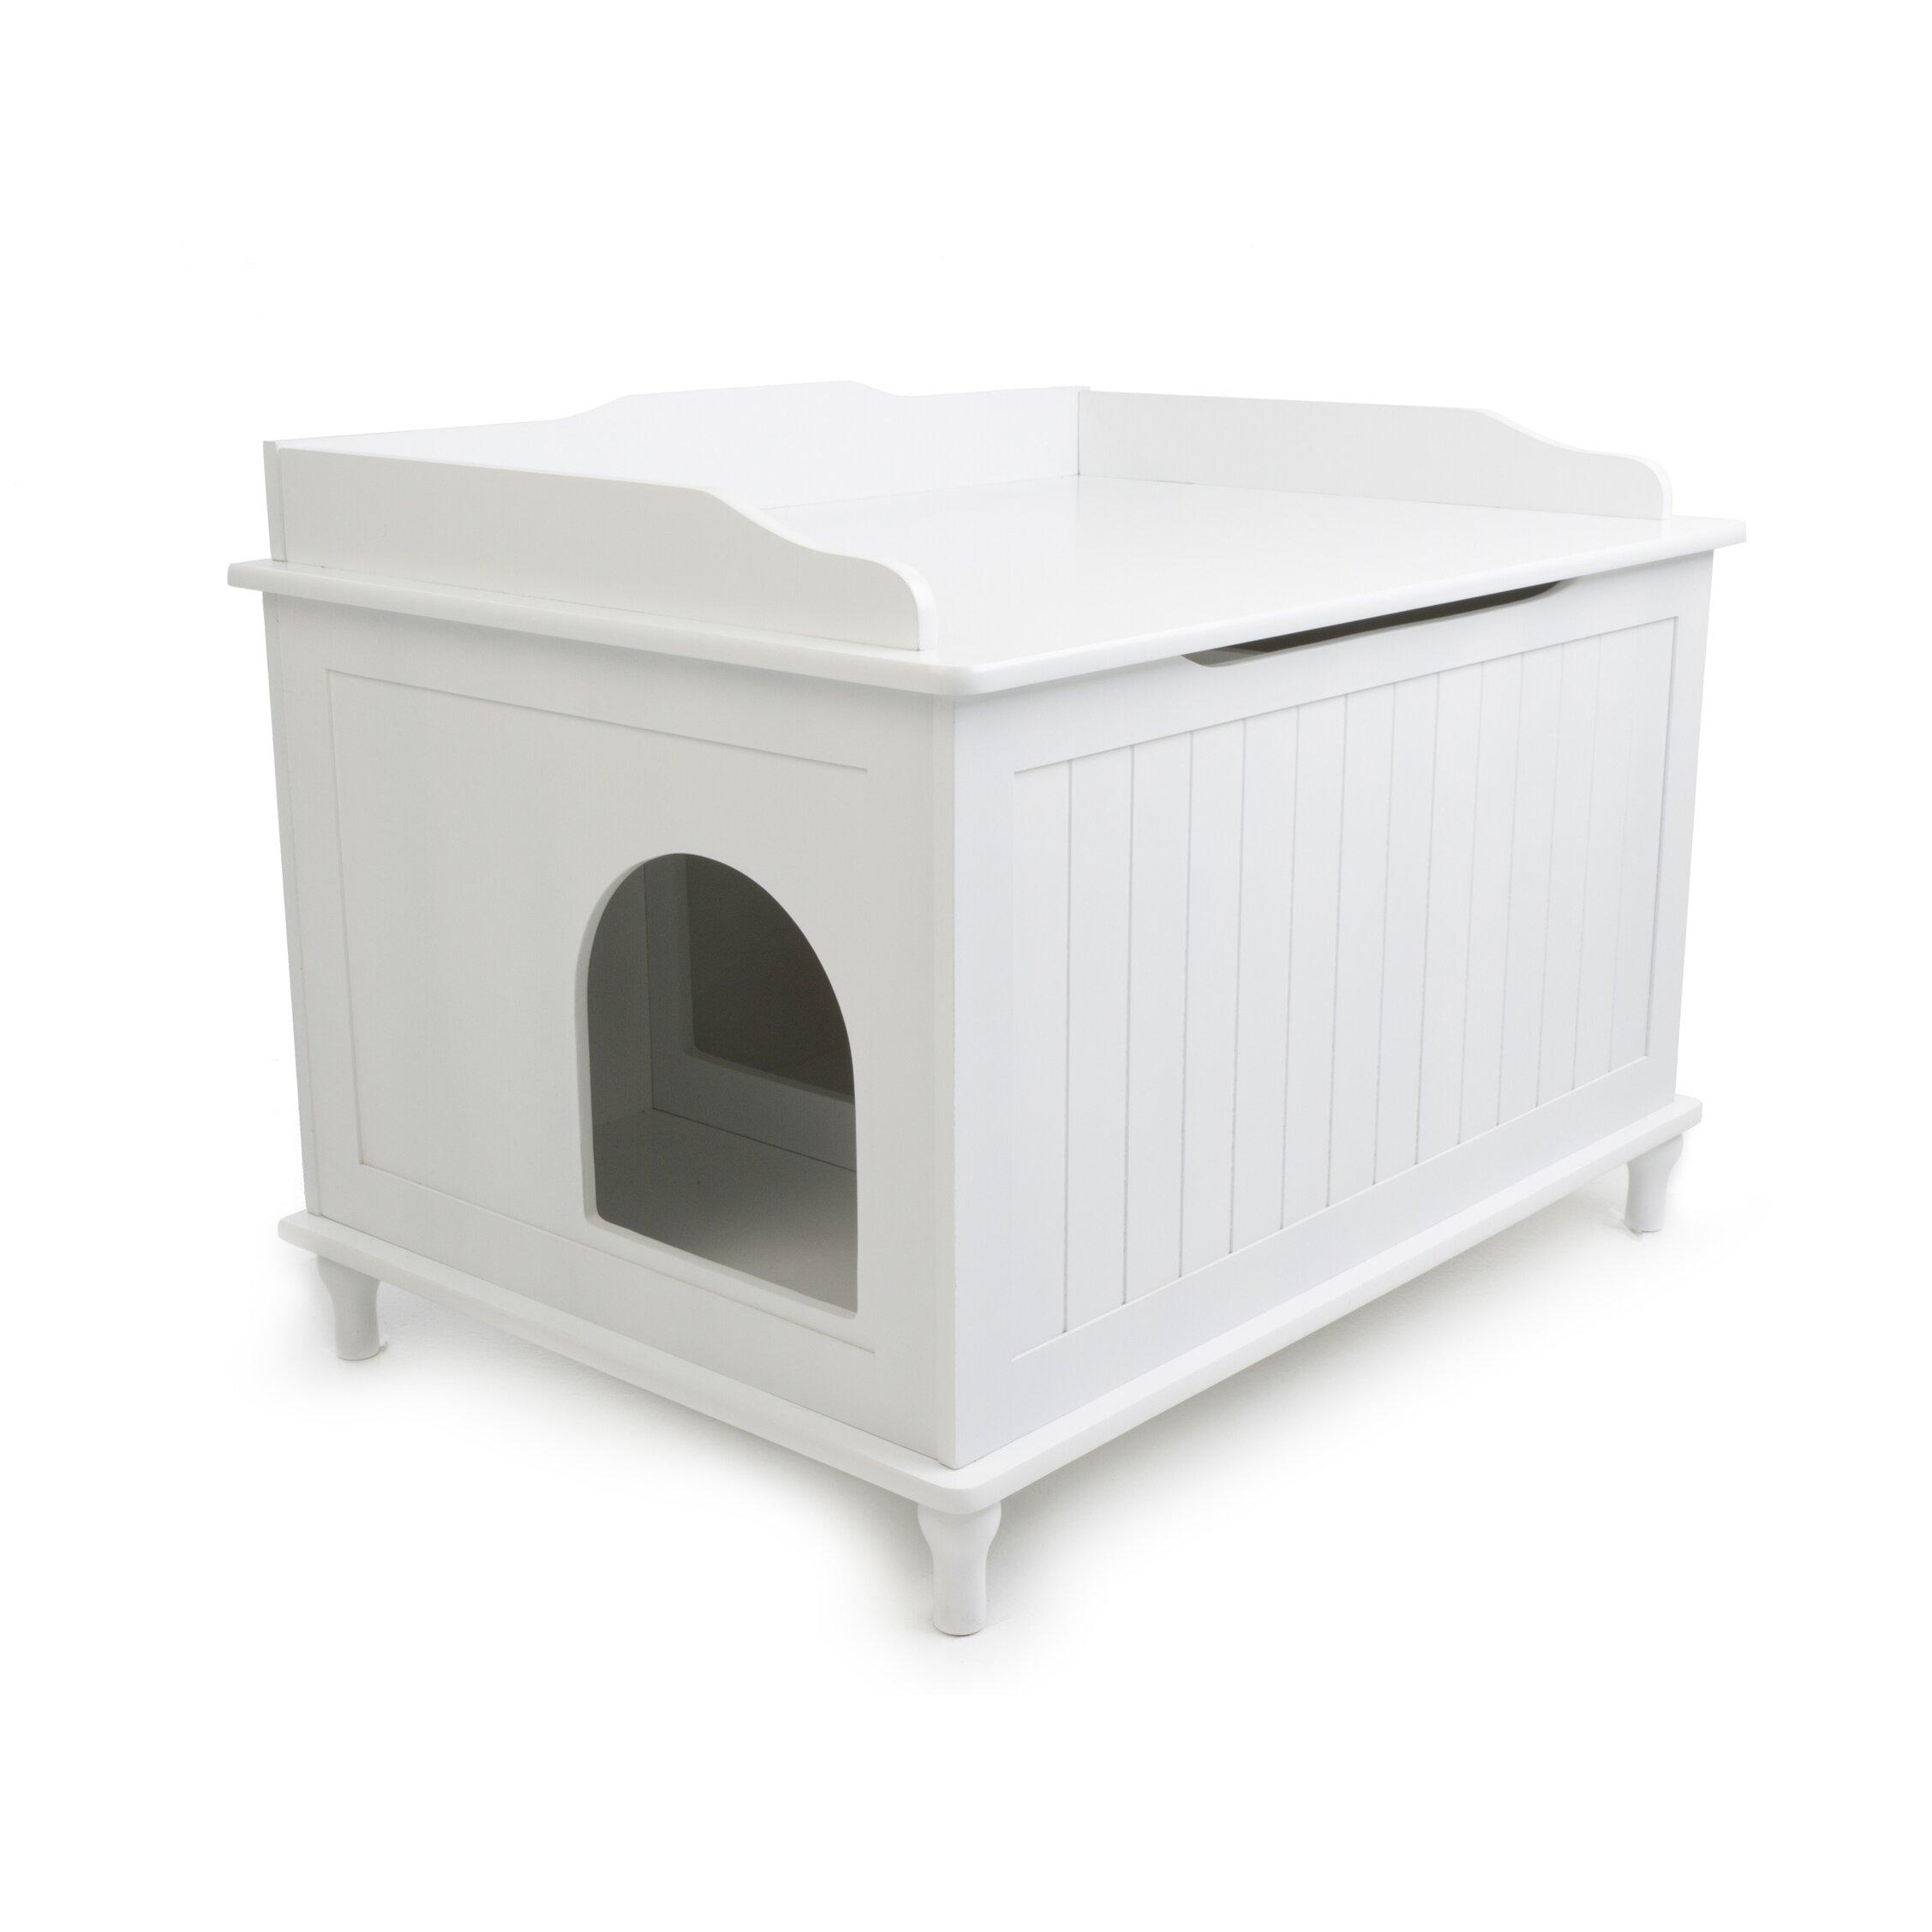 designer pet products mia litter box enclosure arena kitty litter box